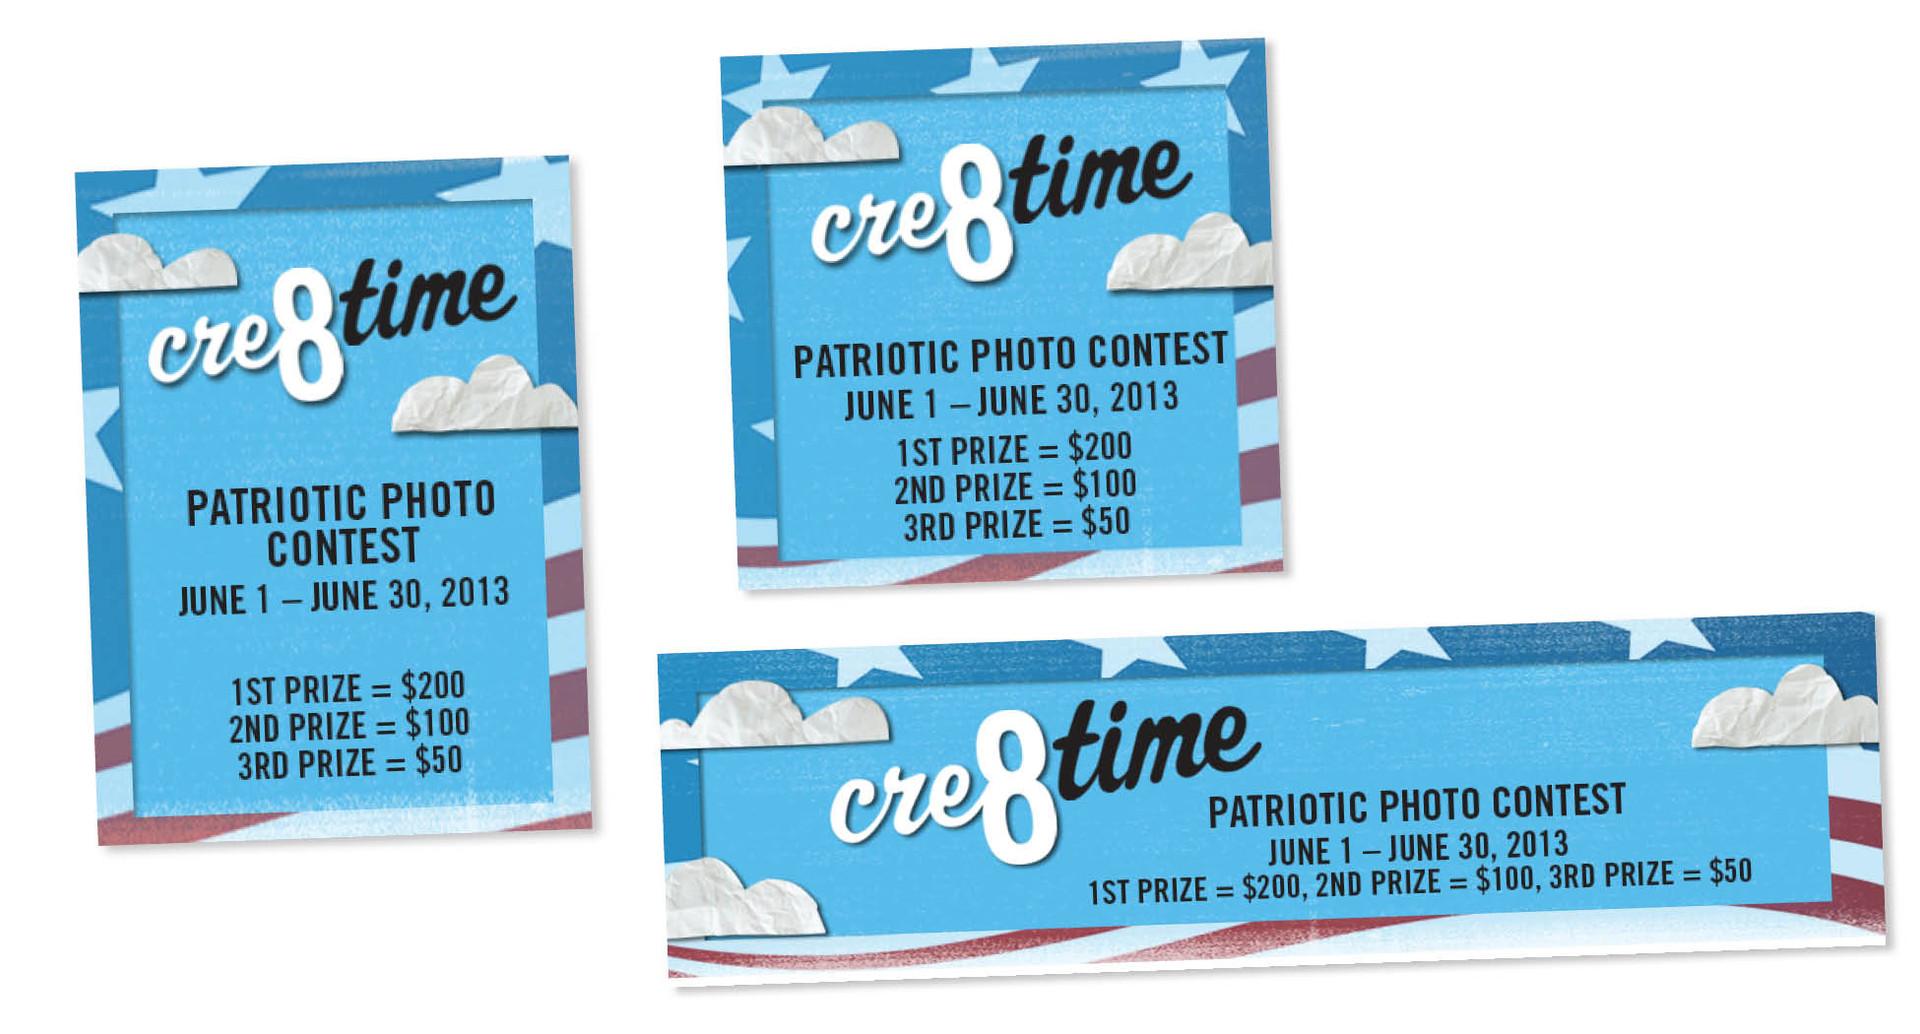 Cre8time instagram/social media ads